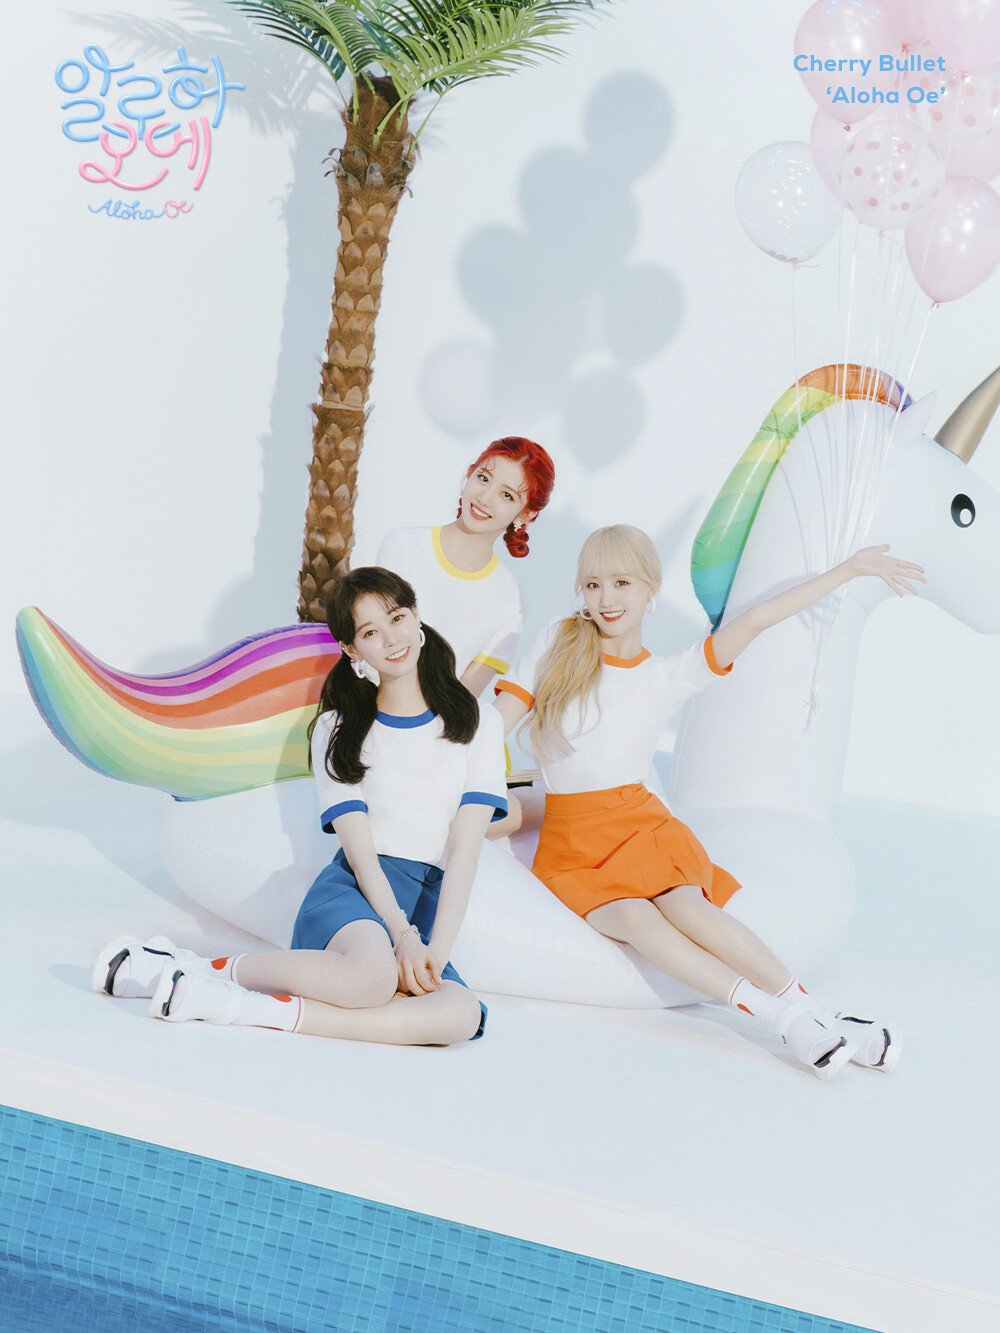 Cherry Bullet 2nd Digital Single  '알로하오에 (Aloha Oe)' <JACKET POSTER - UNIT>